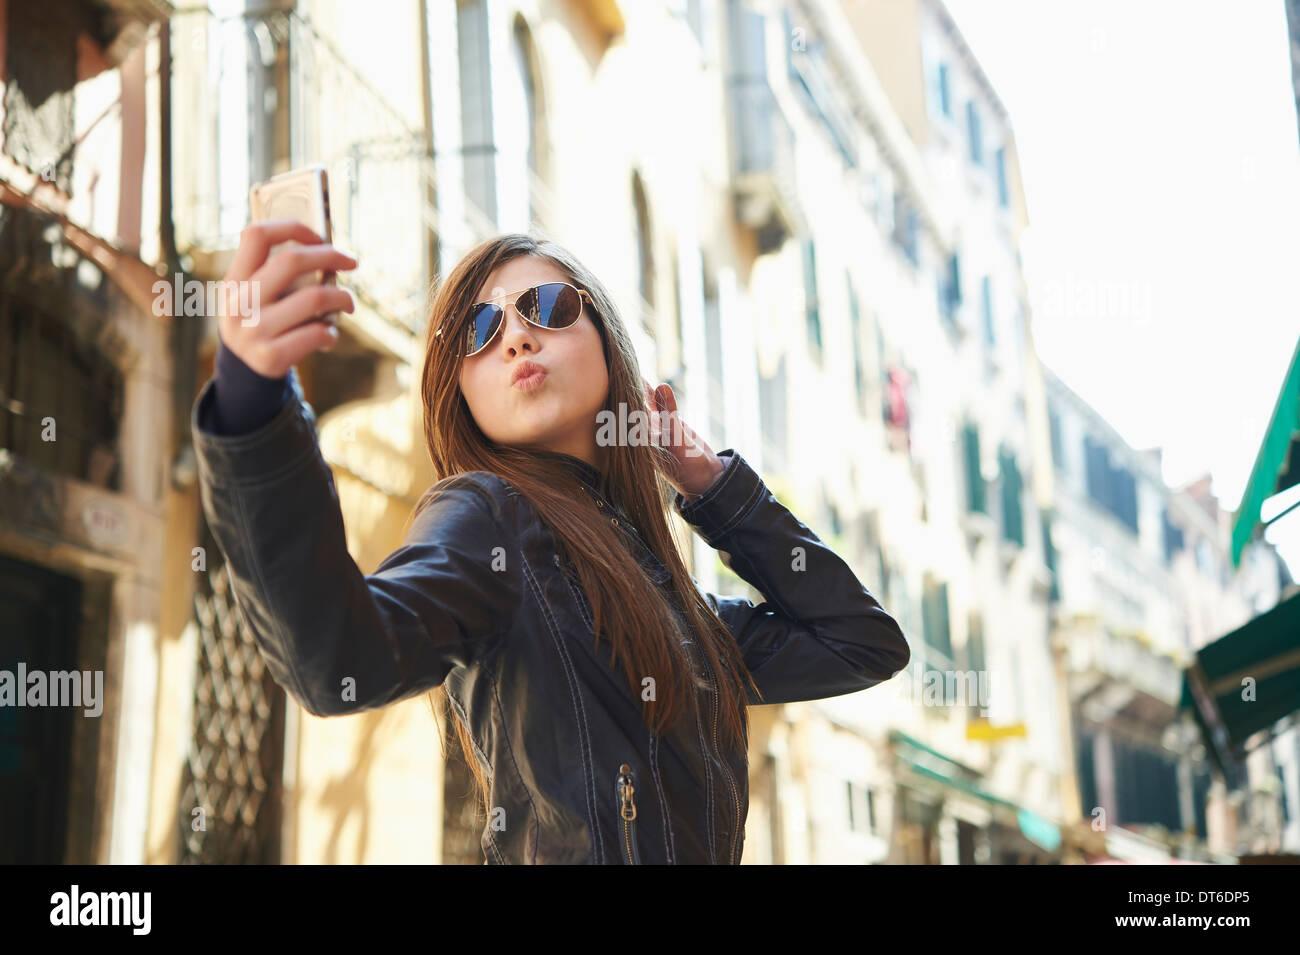 Girl taking sur smartphone selfies, Venise, Italie Photo Stock